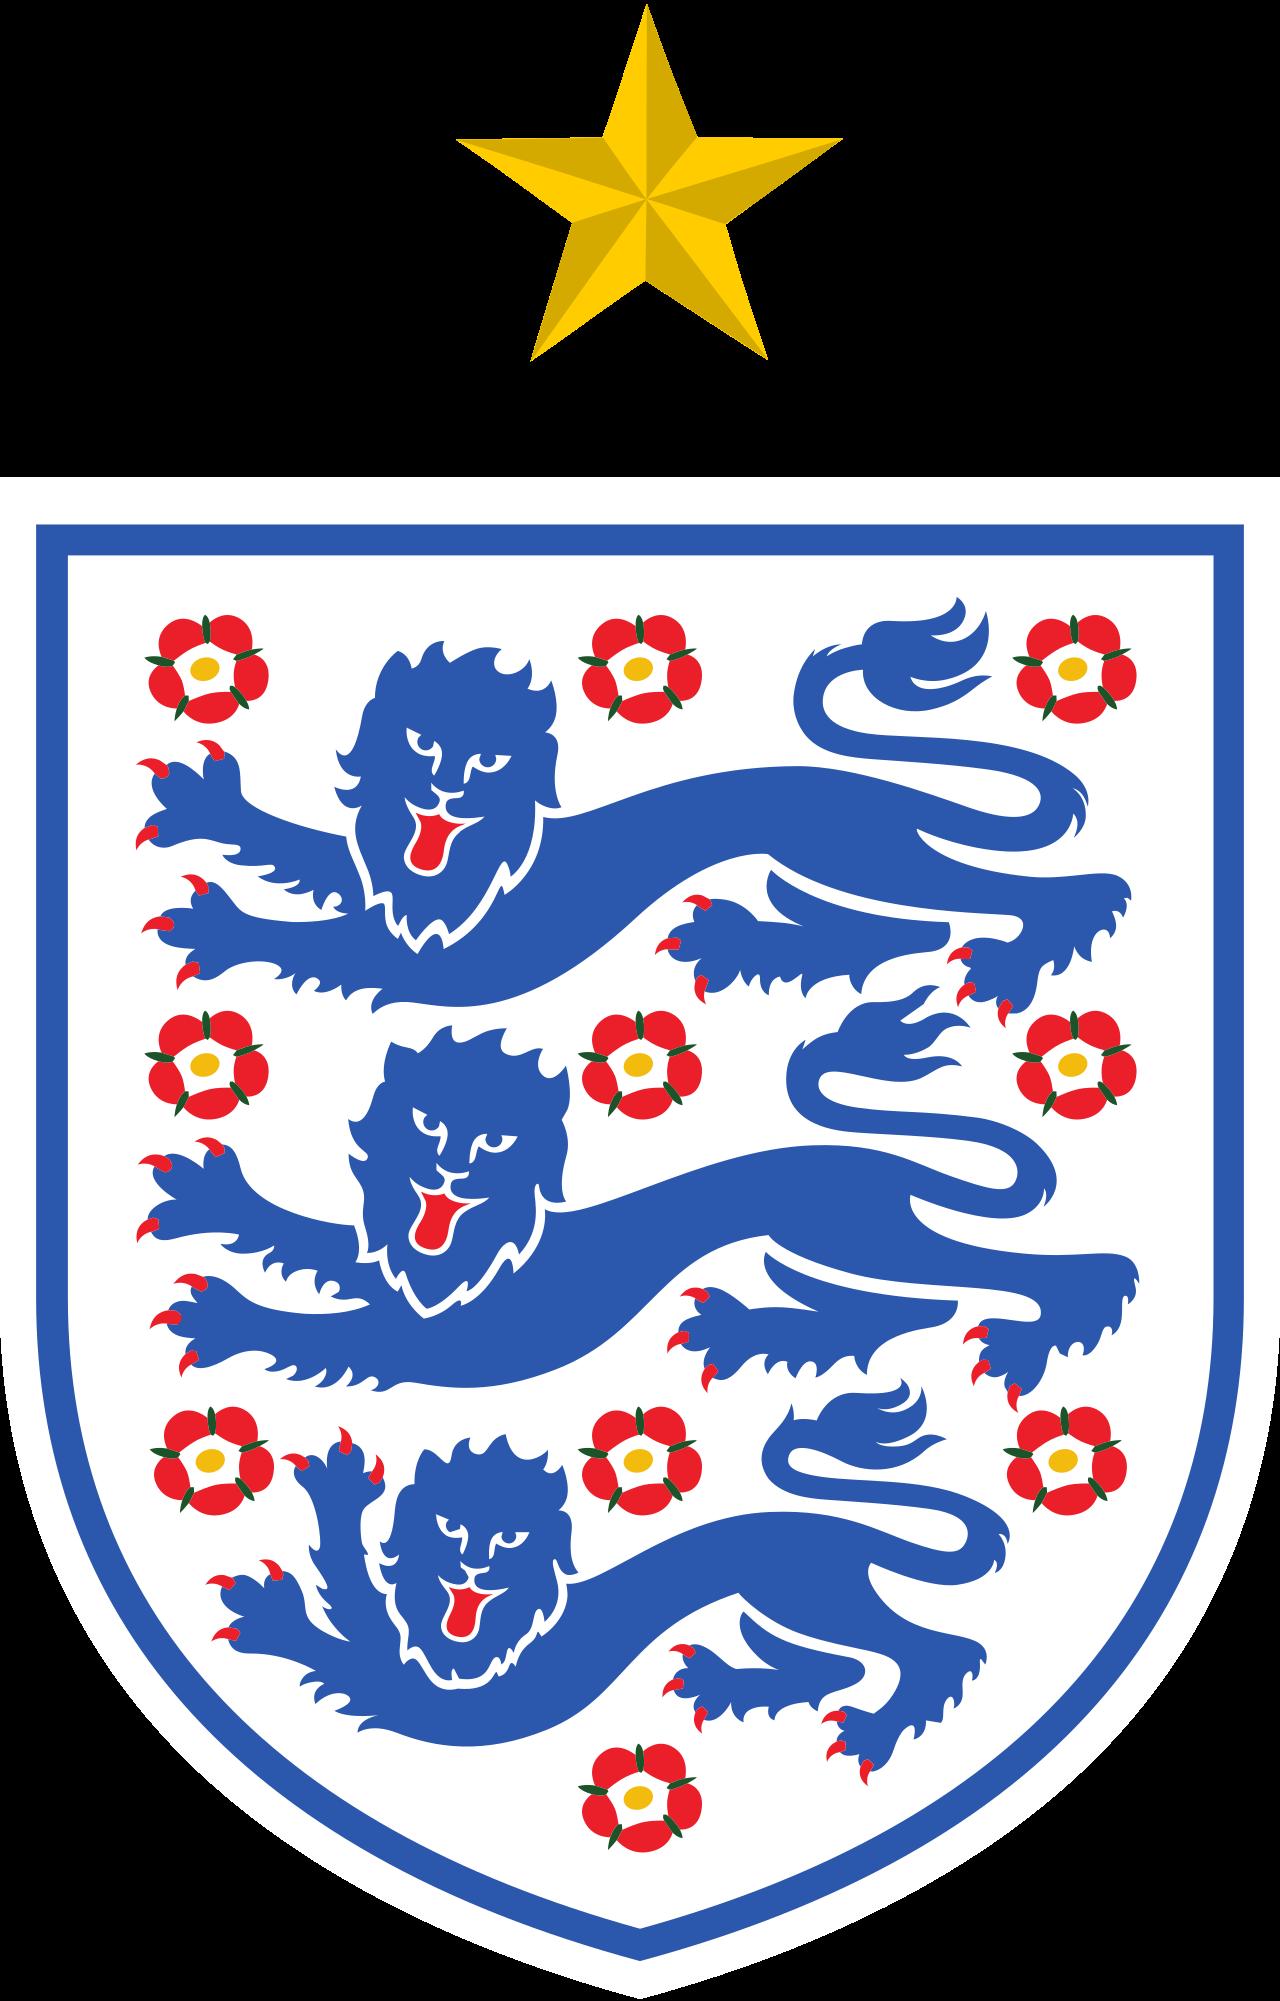 England National Football Team Wikipedia England National Football Team England Football Badge England Football Team